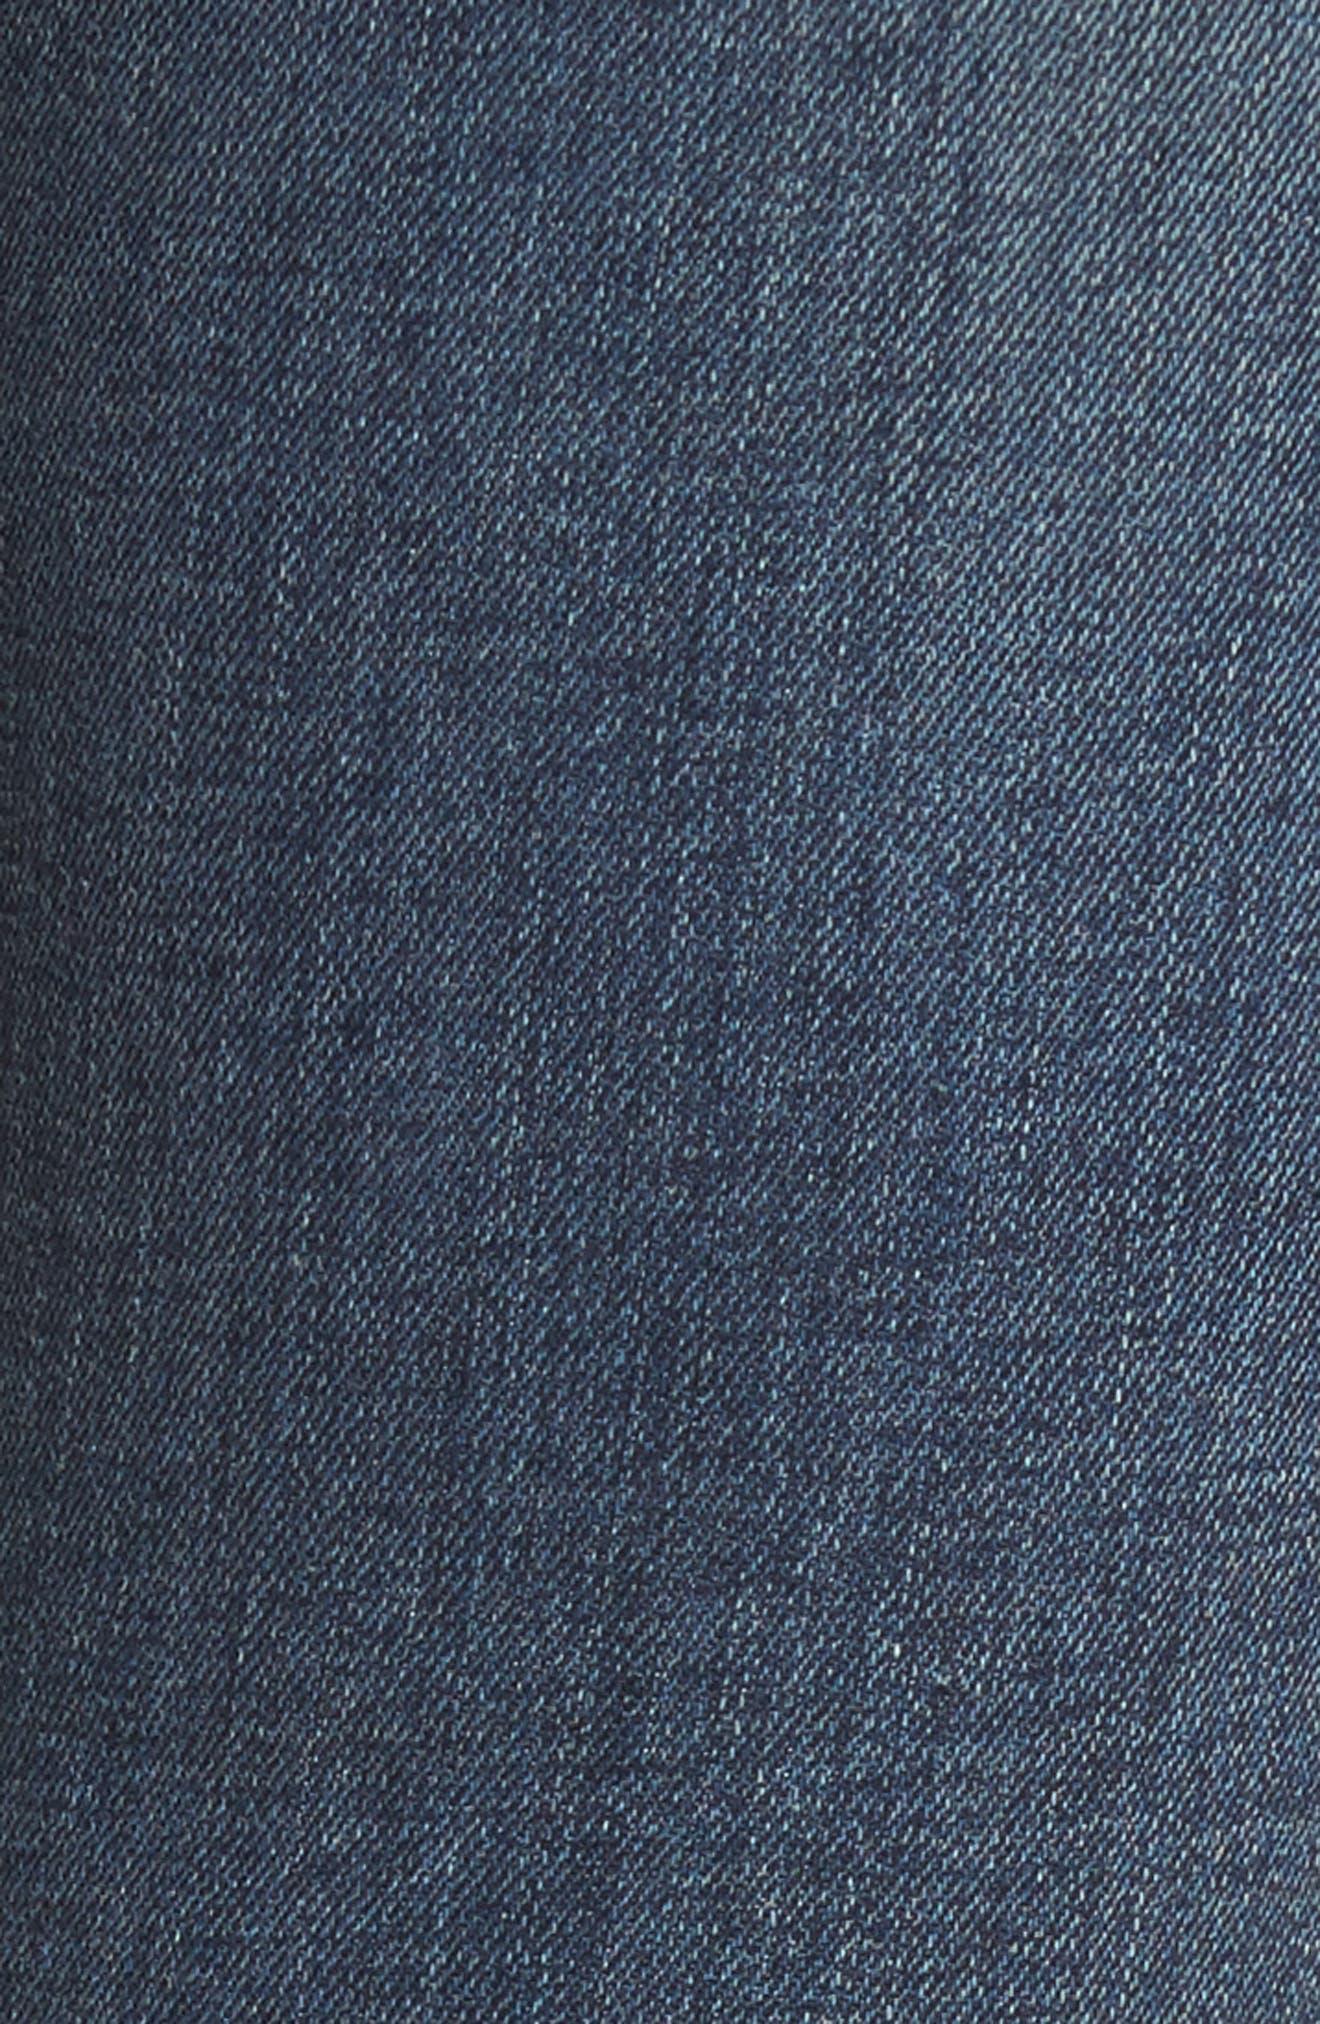 The Stiletto High Waist Skinny Jeans,                             Alternate thumbnail 5, color,                             477